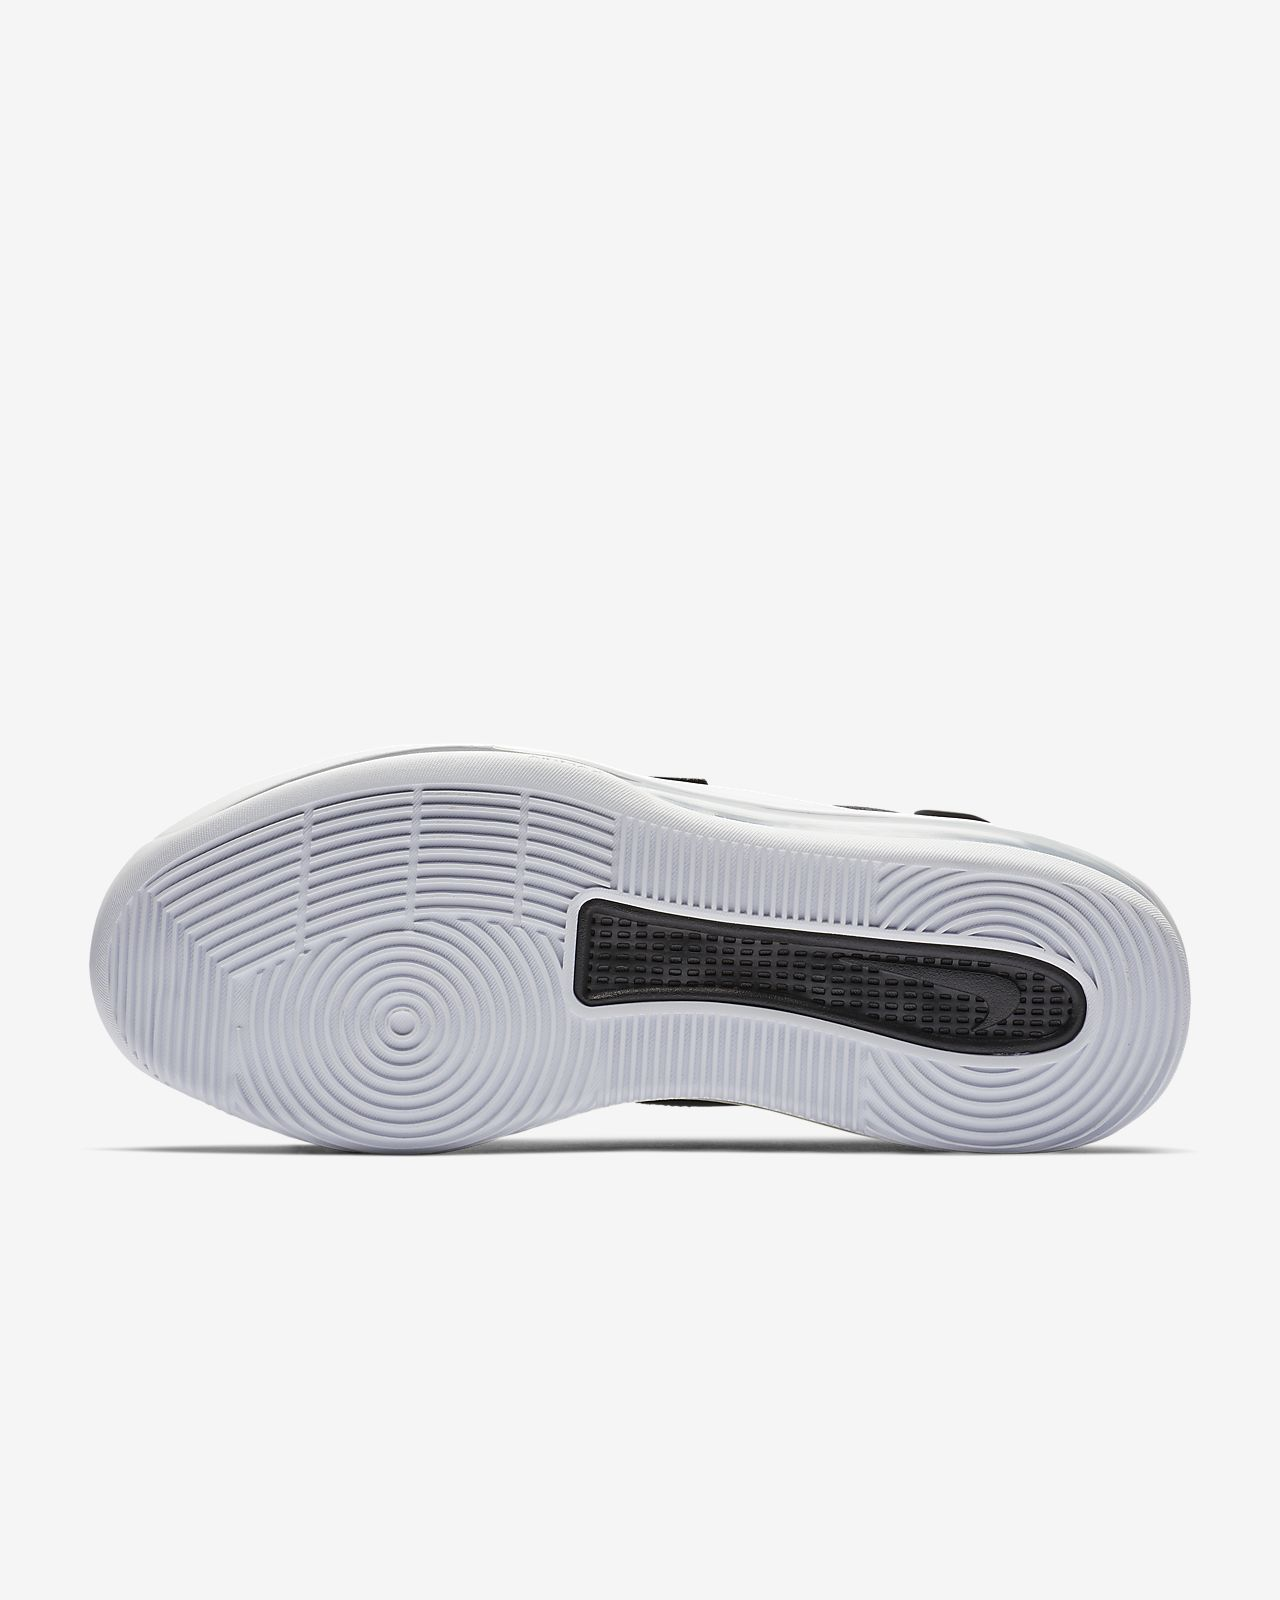 a221d64bb27 Nike Air Force Max Basketball Shoe. Nike.com IN